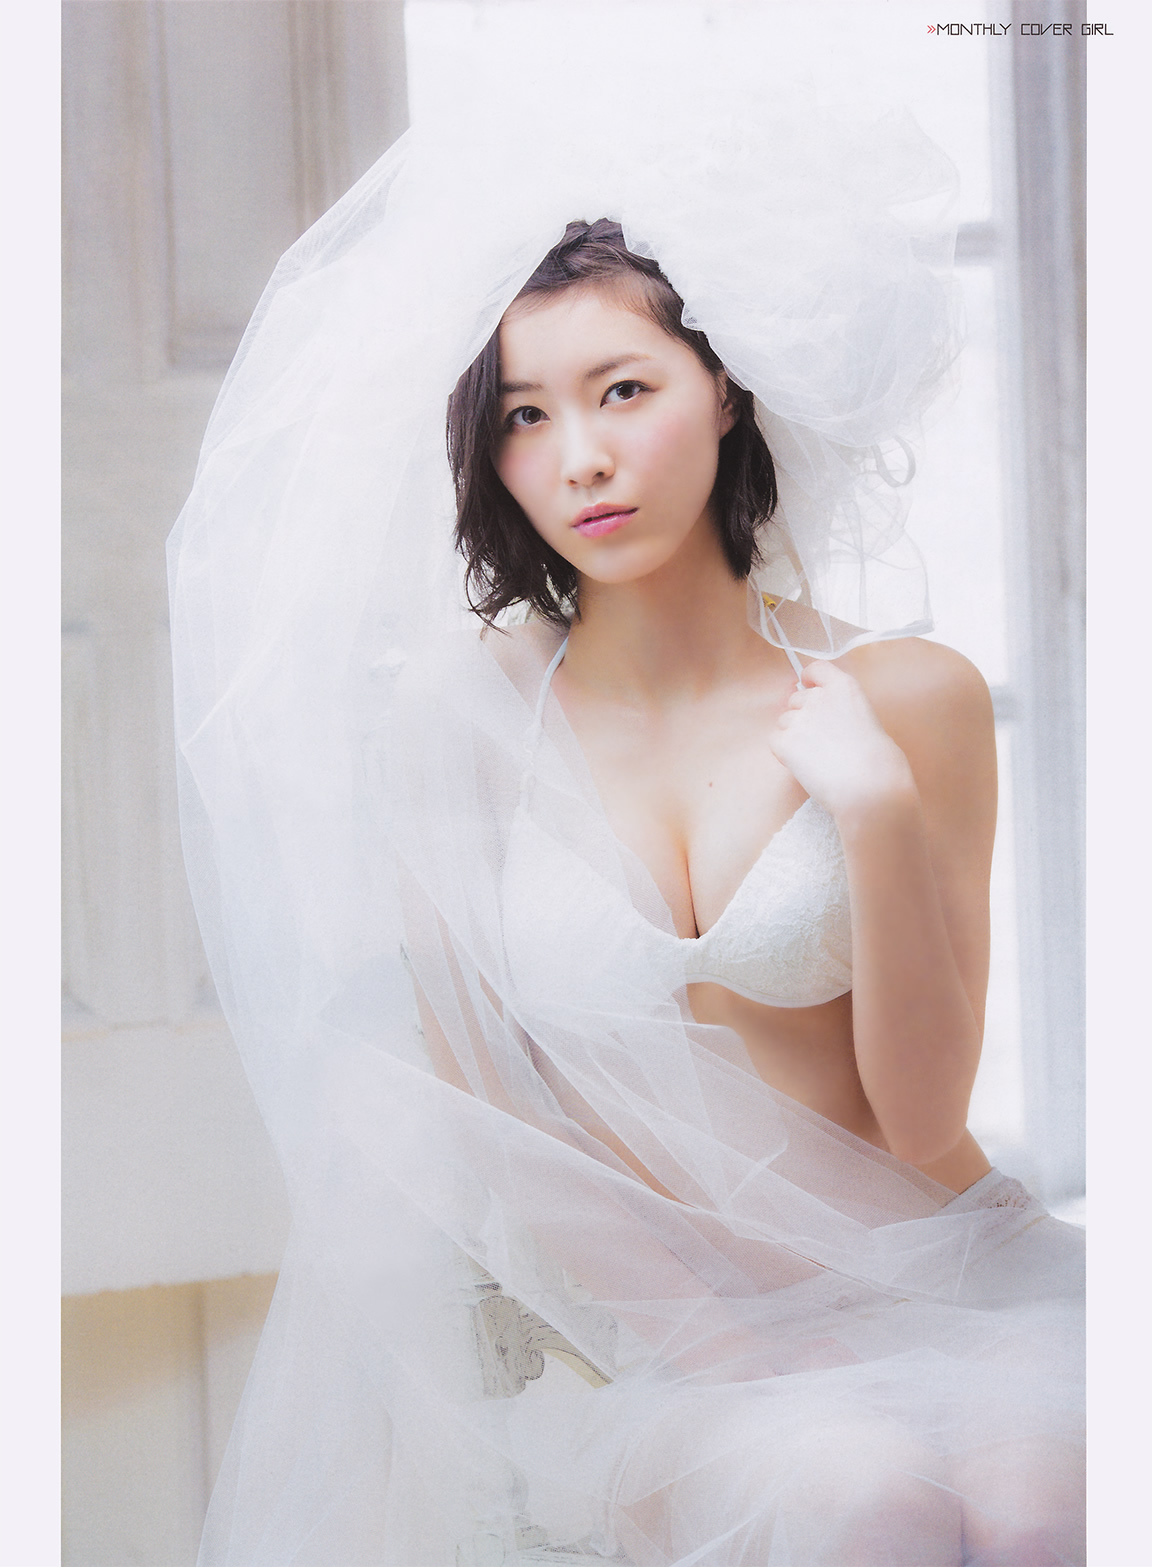 松井珠理奈の画像 p1_34